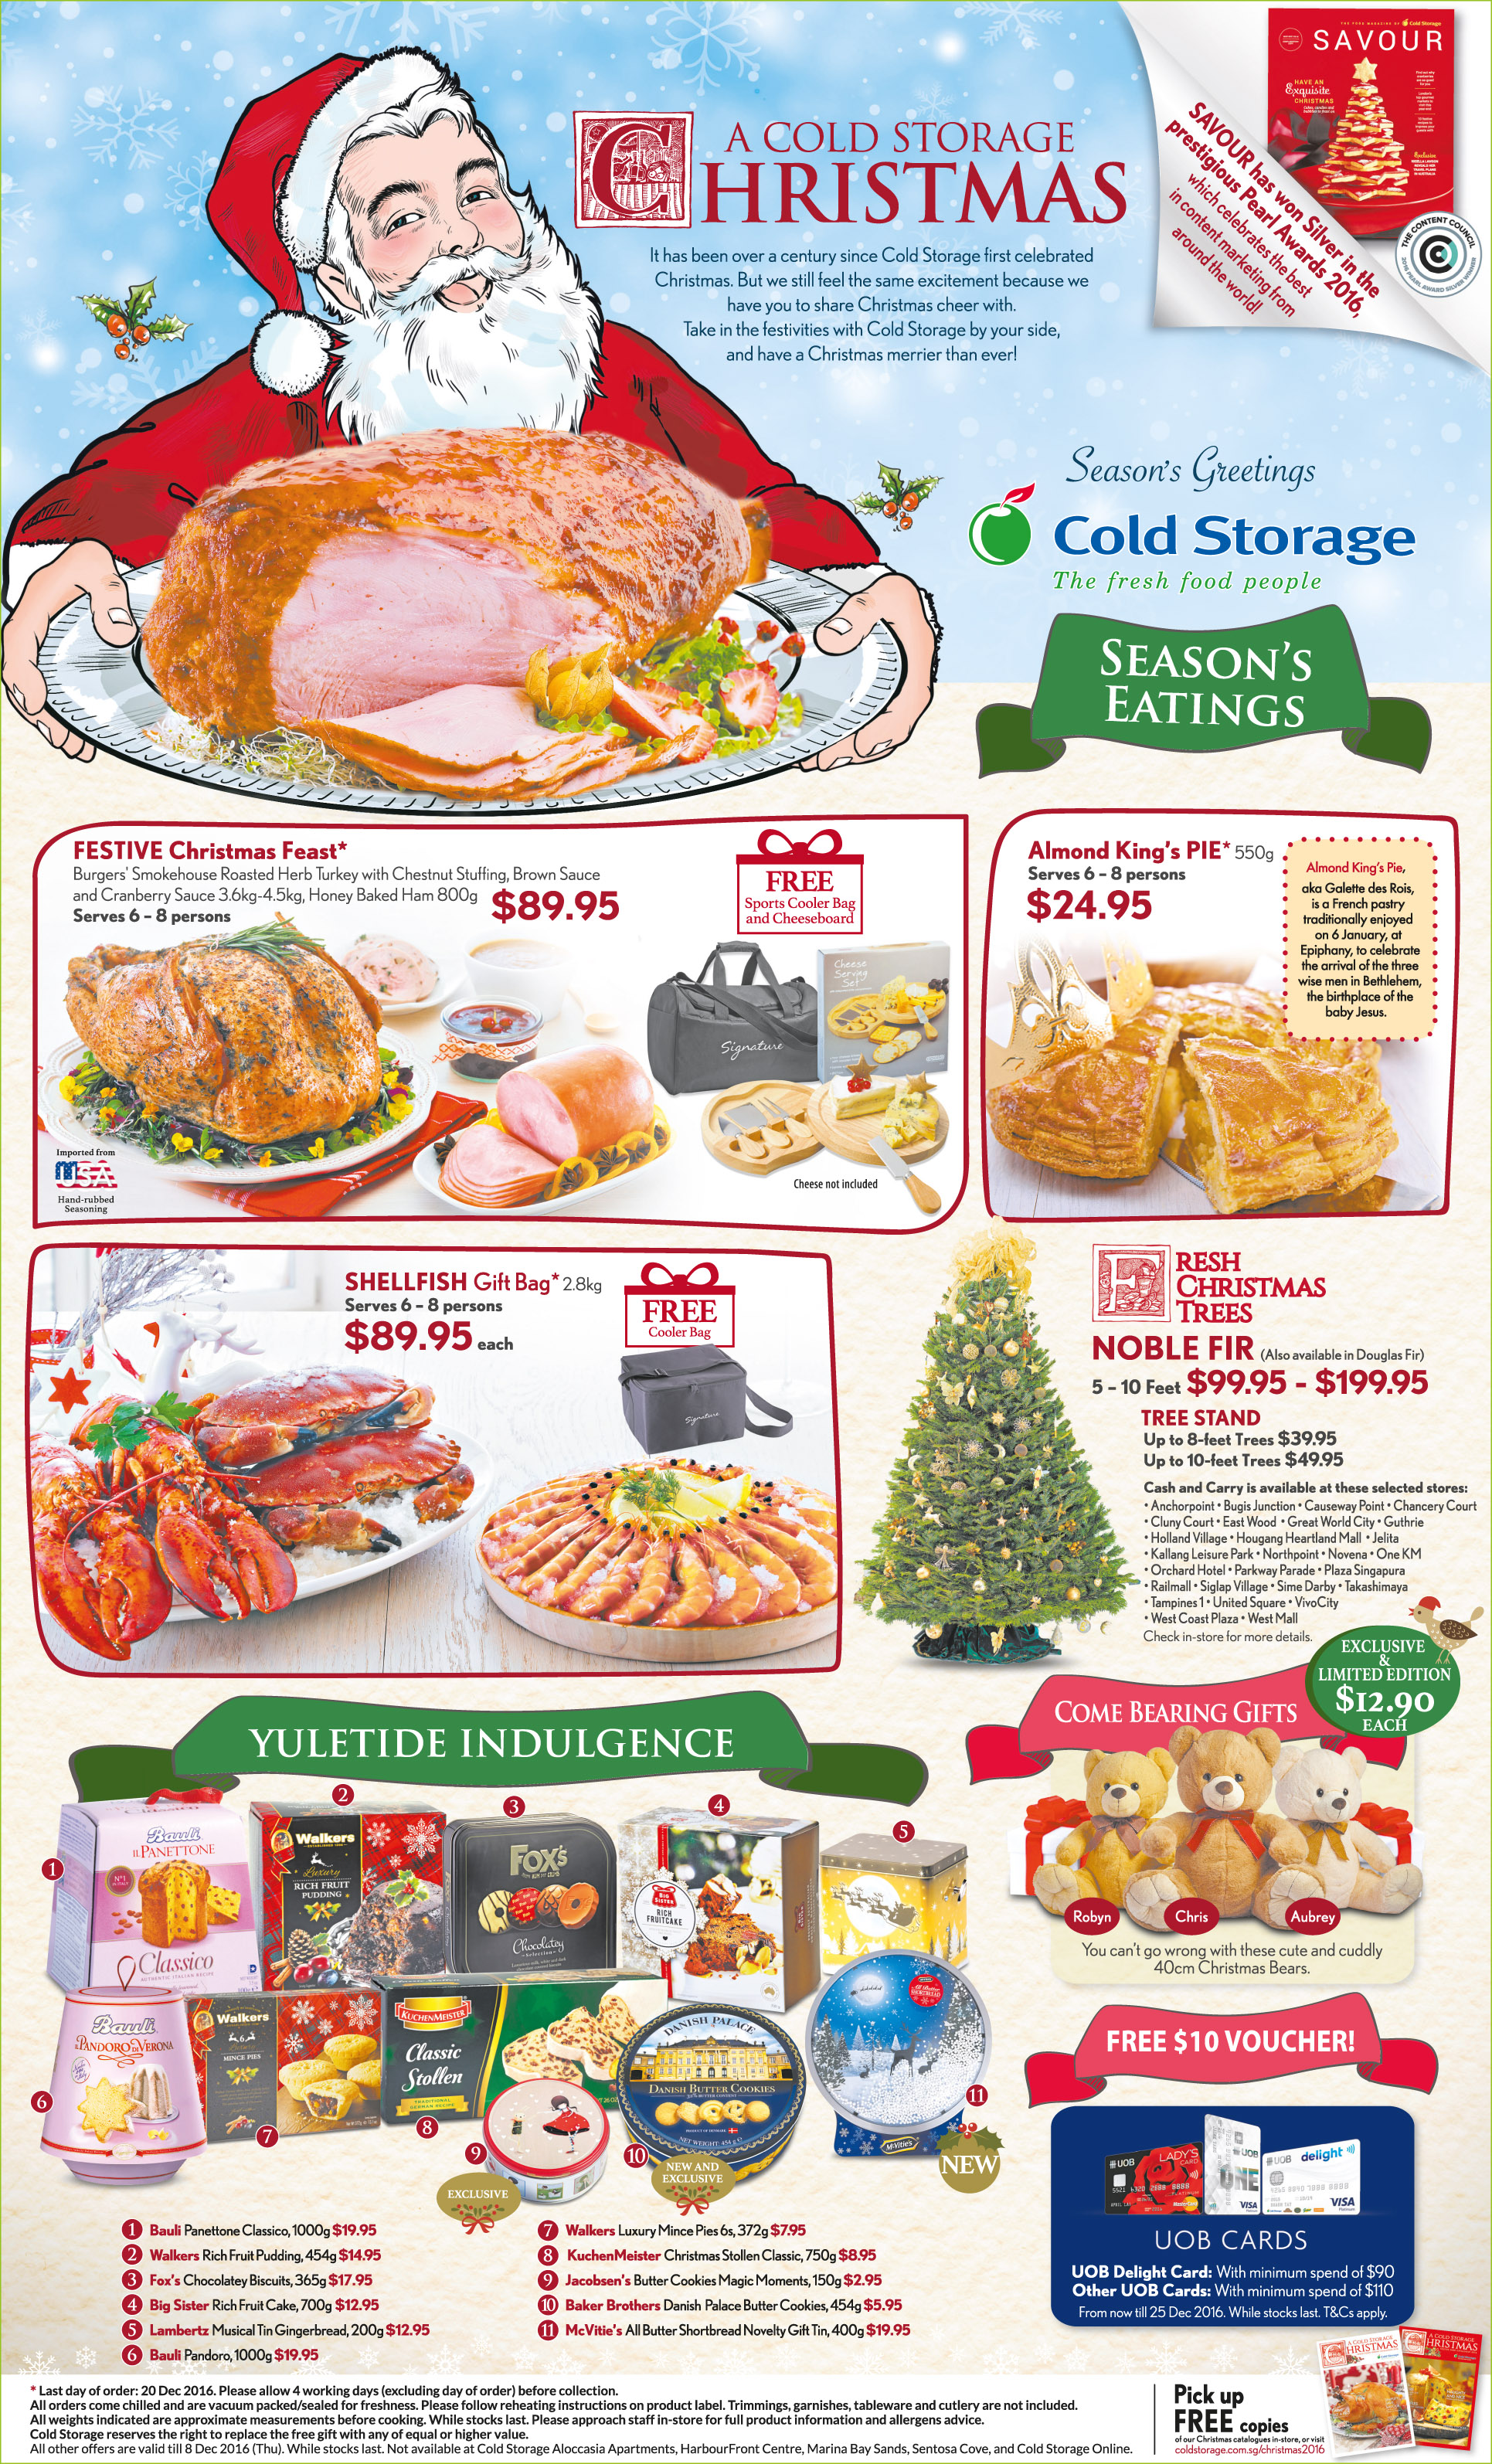 Christmas Order Programme – Yuletide Indulgence (Till 8 Dec)